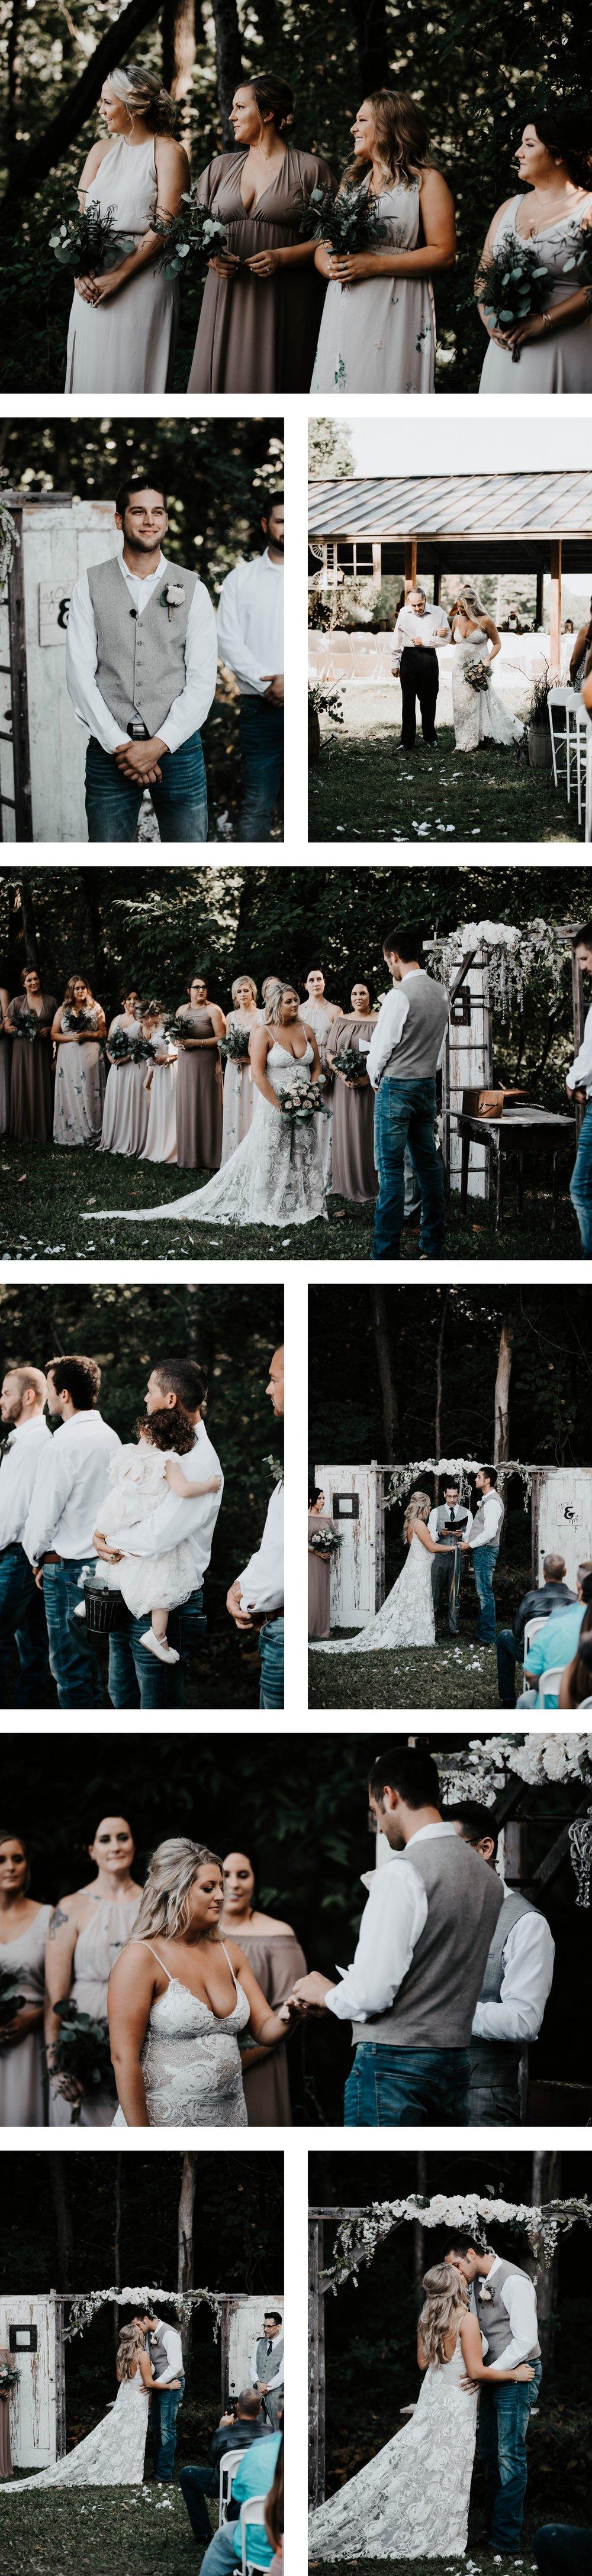 The Pudik Wedding 10.jpg